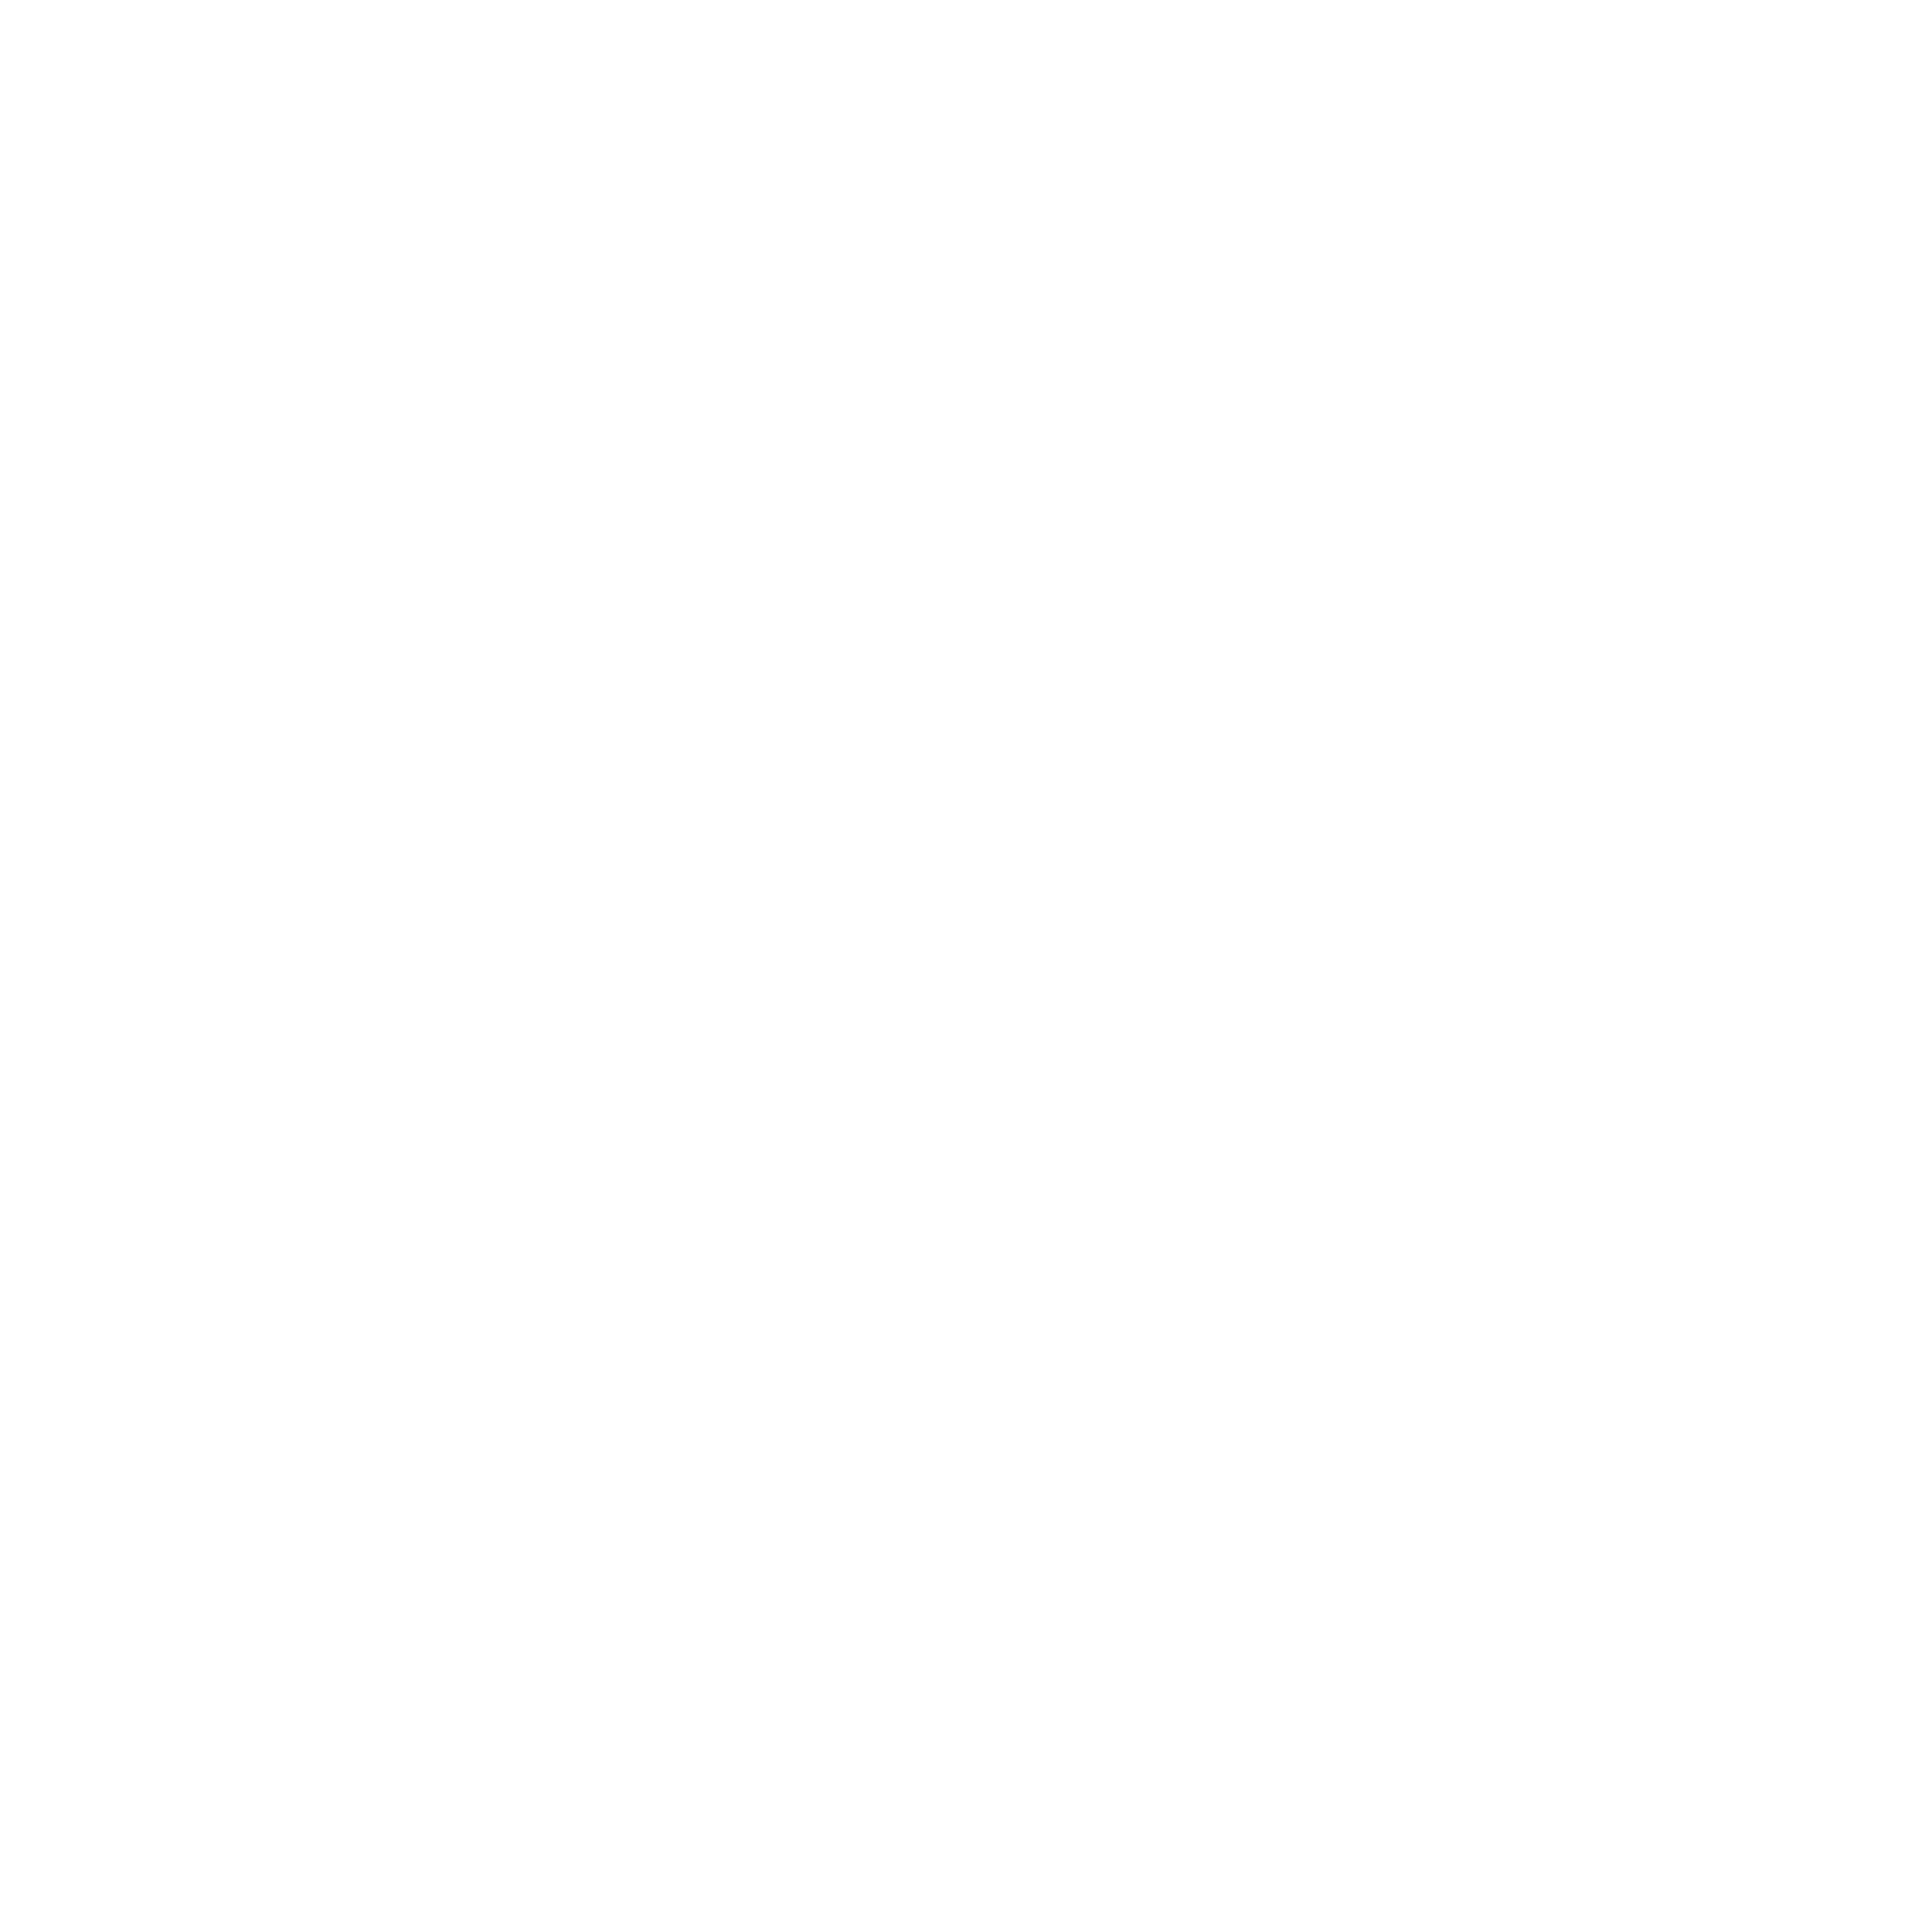 Bens Design